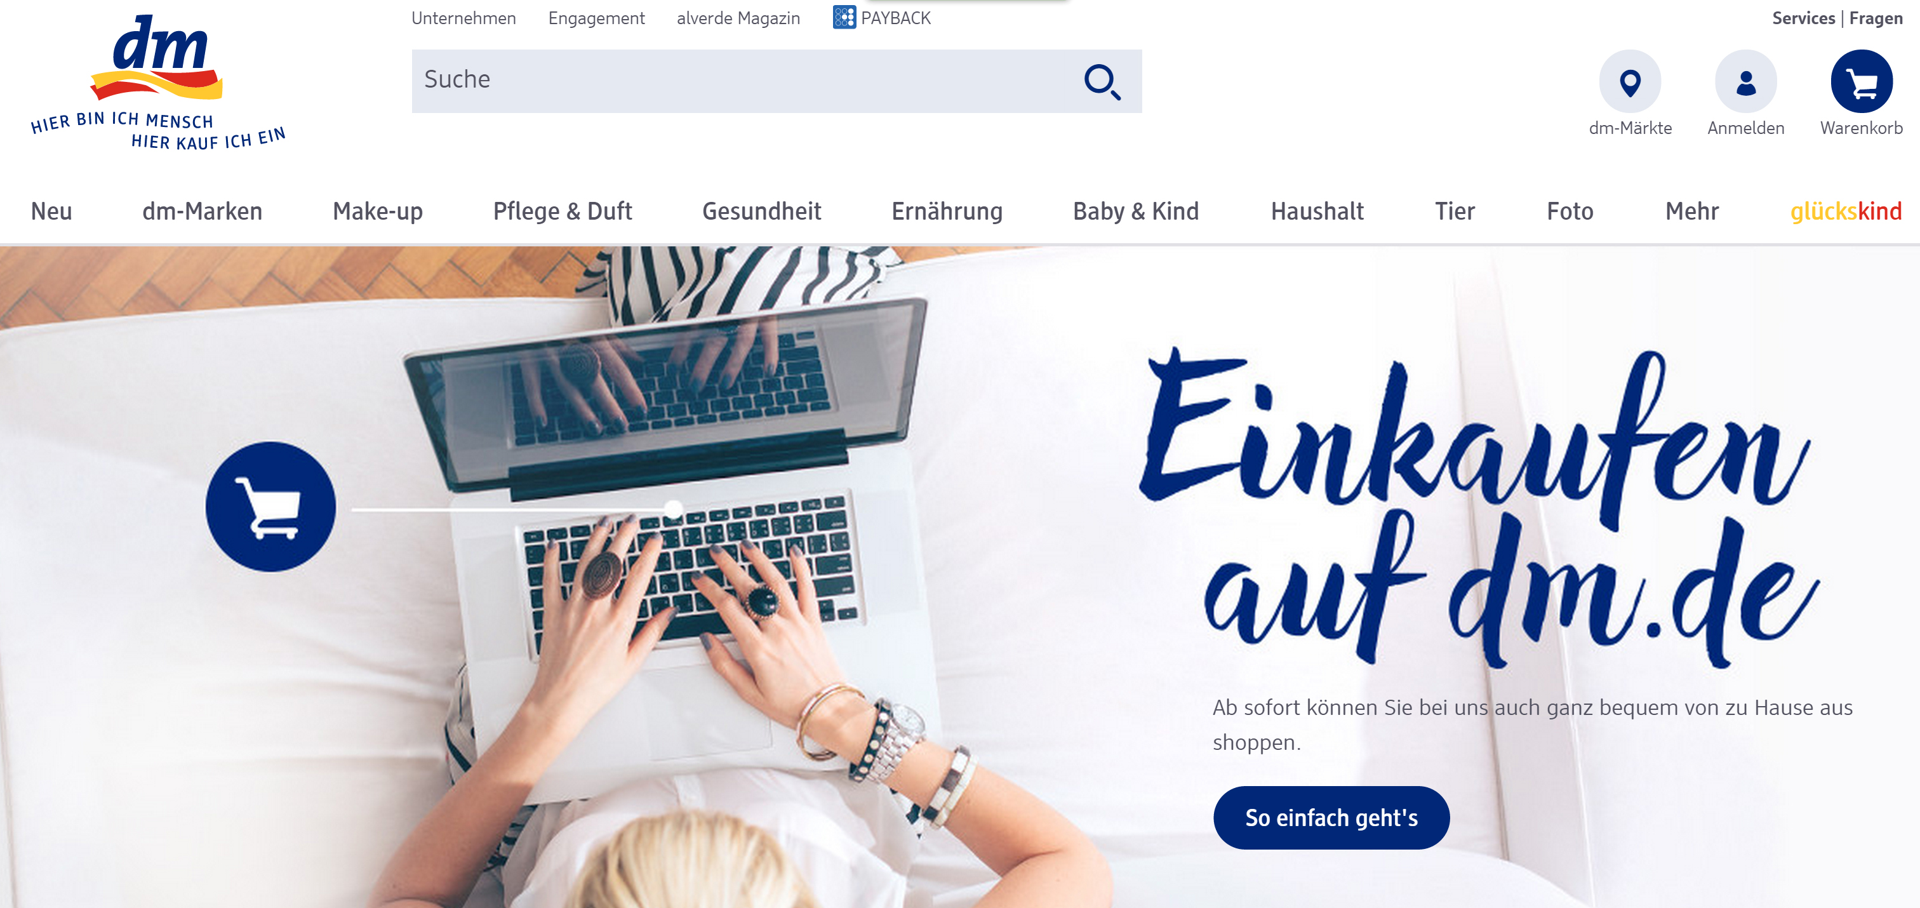 dm startet onlineshop in deutschland mankos inklusive. Black Bedroom Furniture Sets. Home Design Ideas